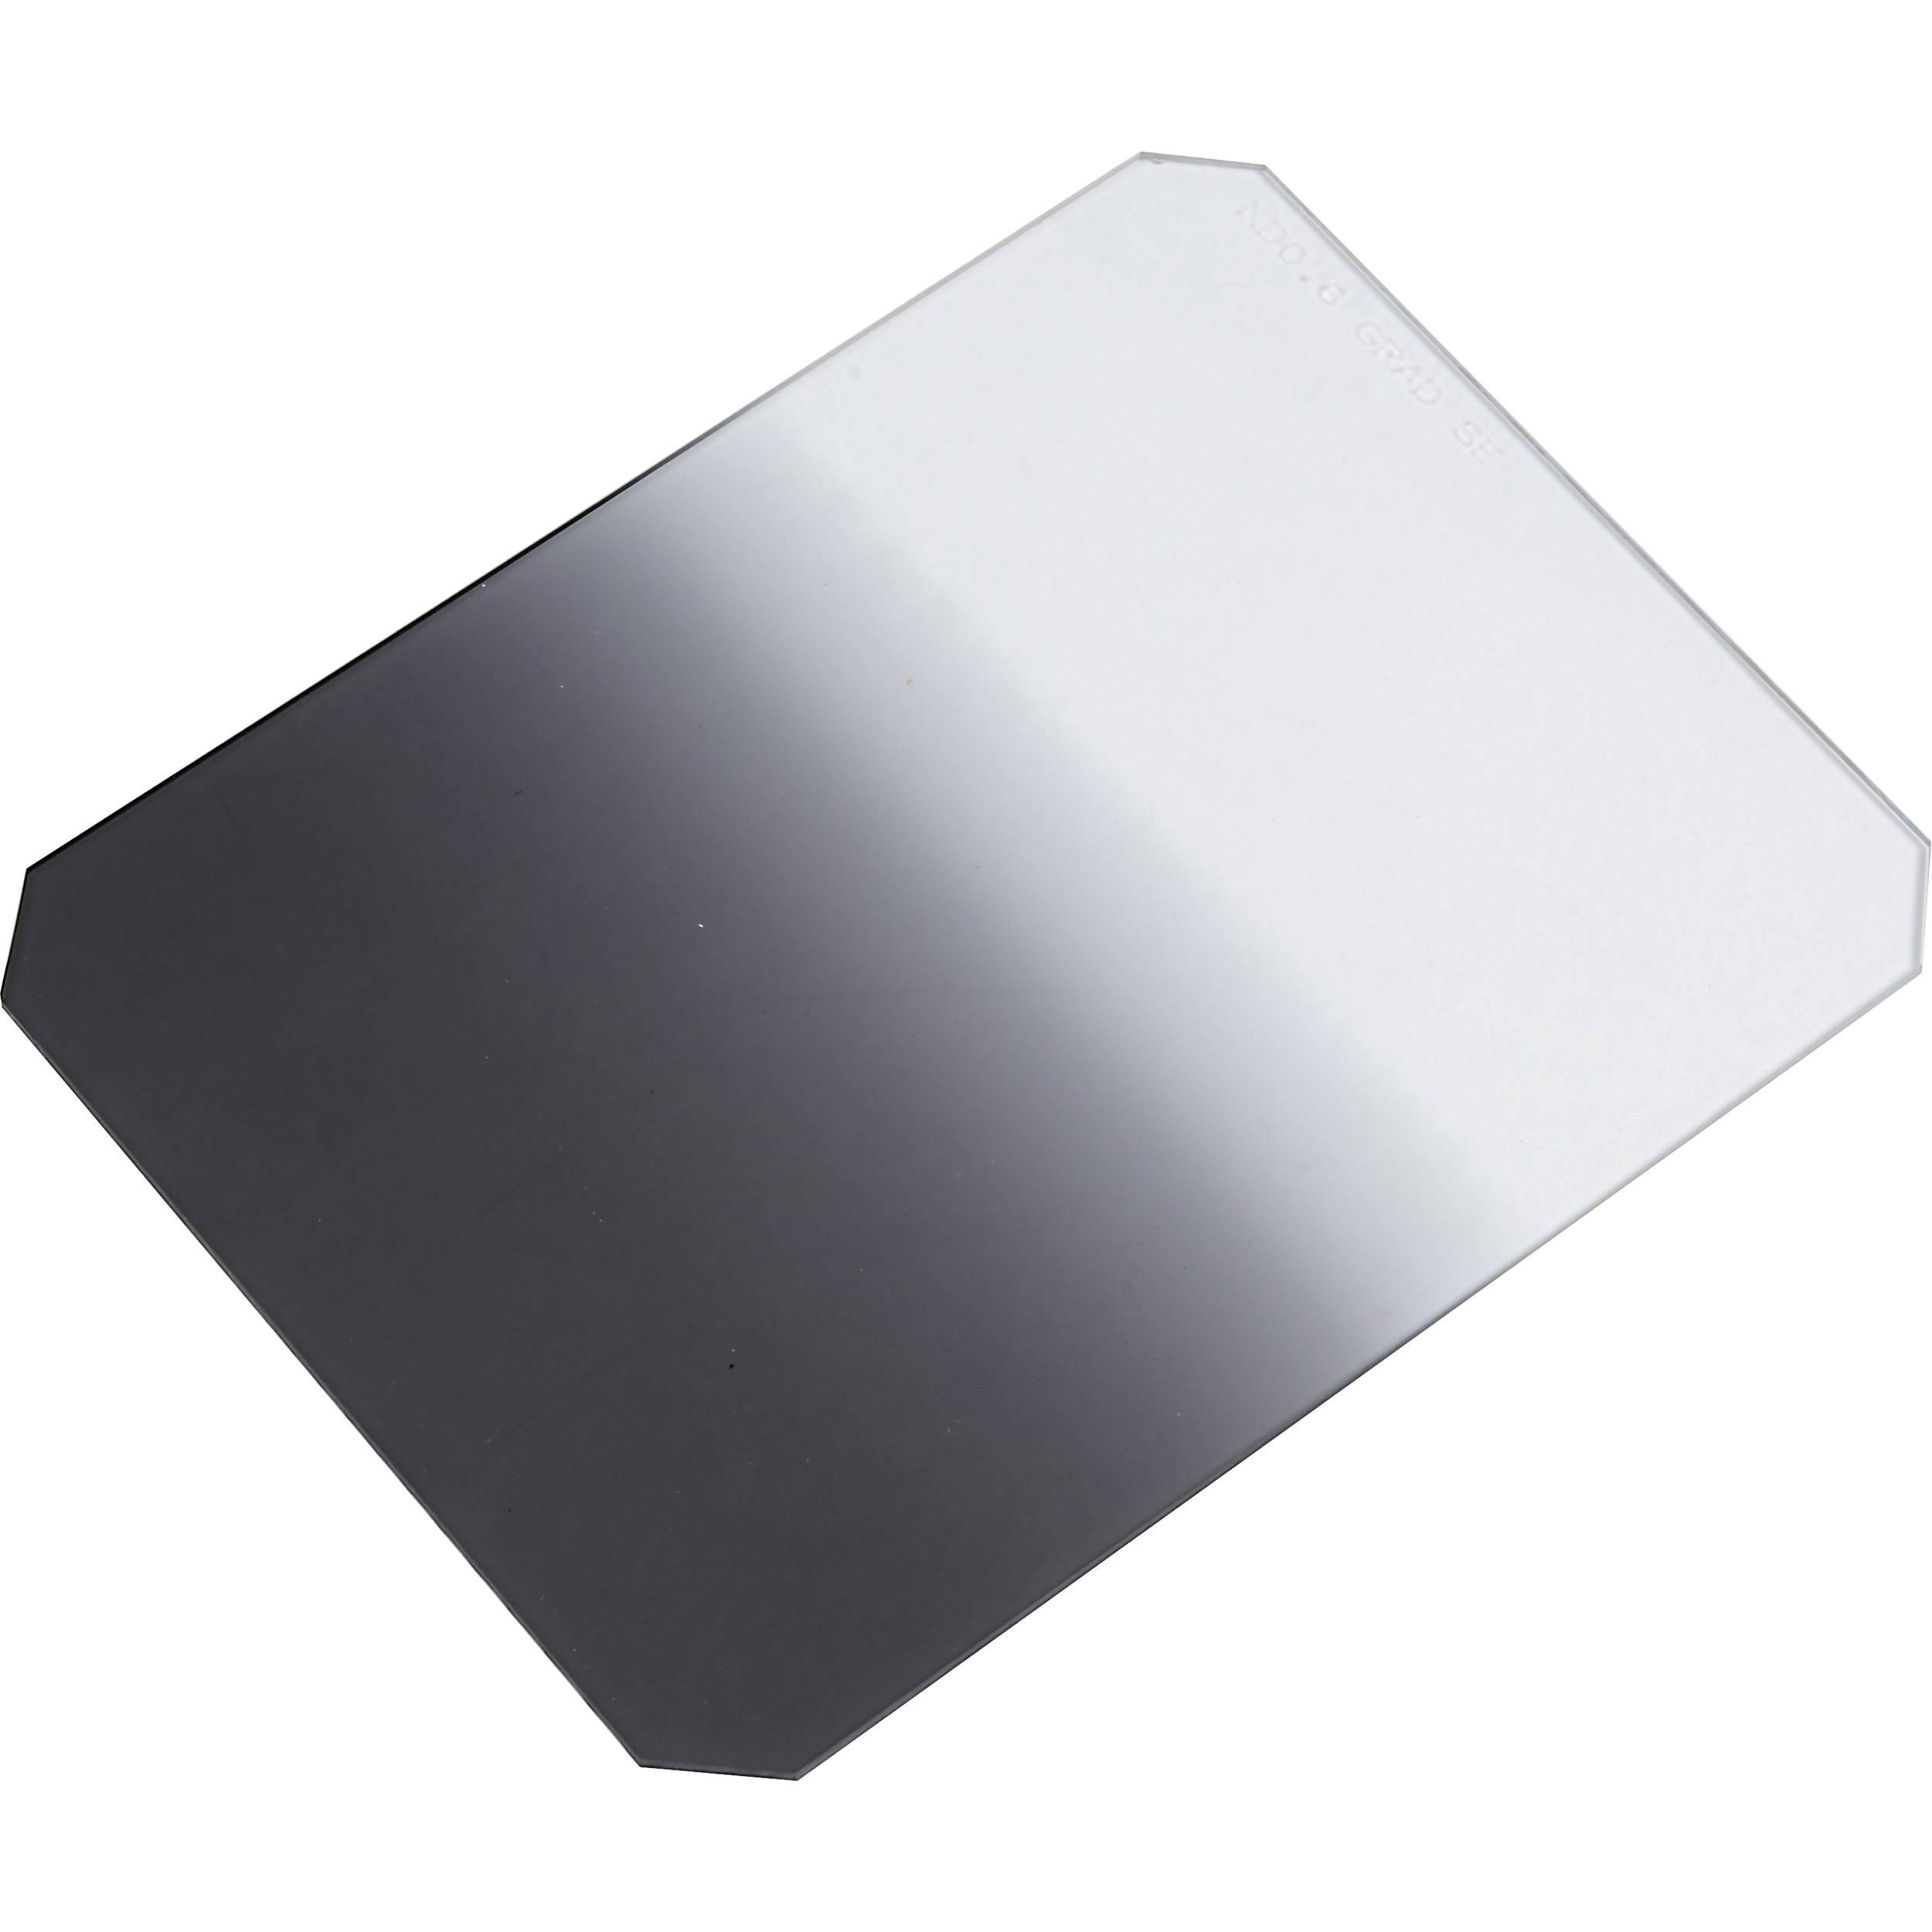 formatt hitech 85 x 110mm soft edge graduated ht85ndse0 6 b h